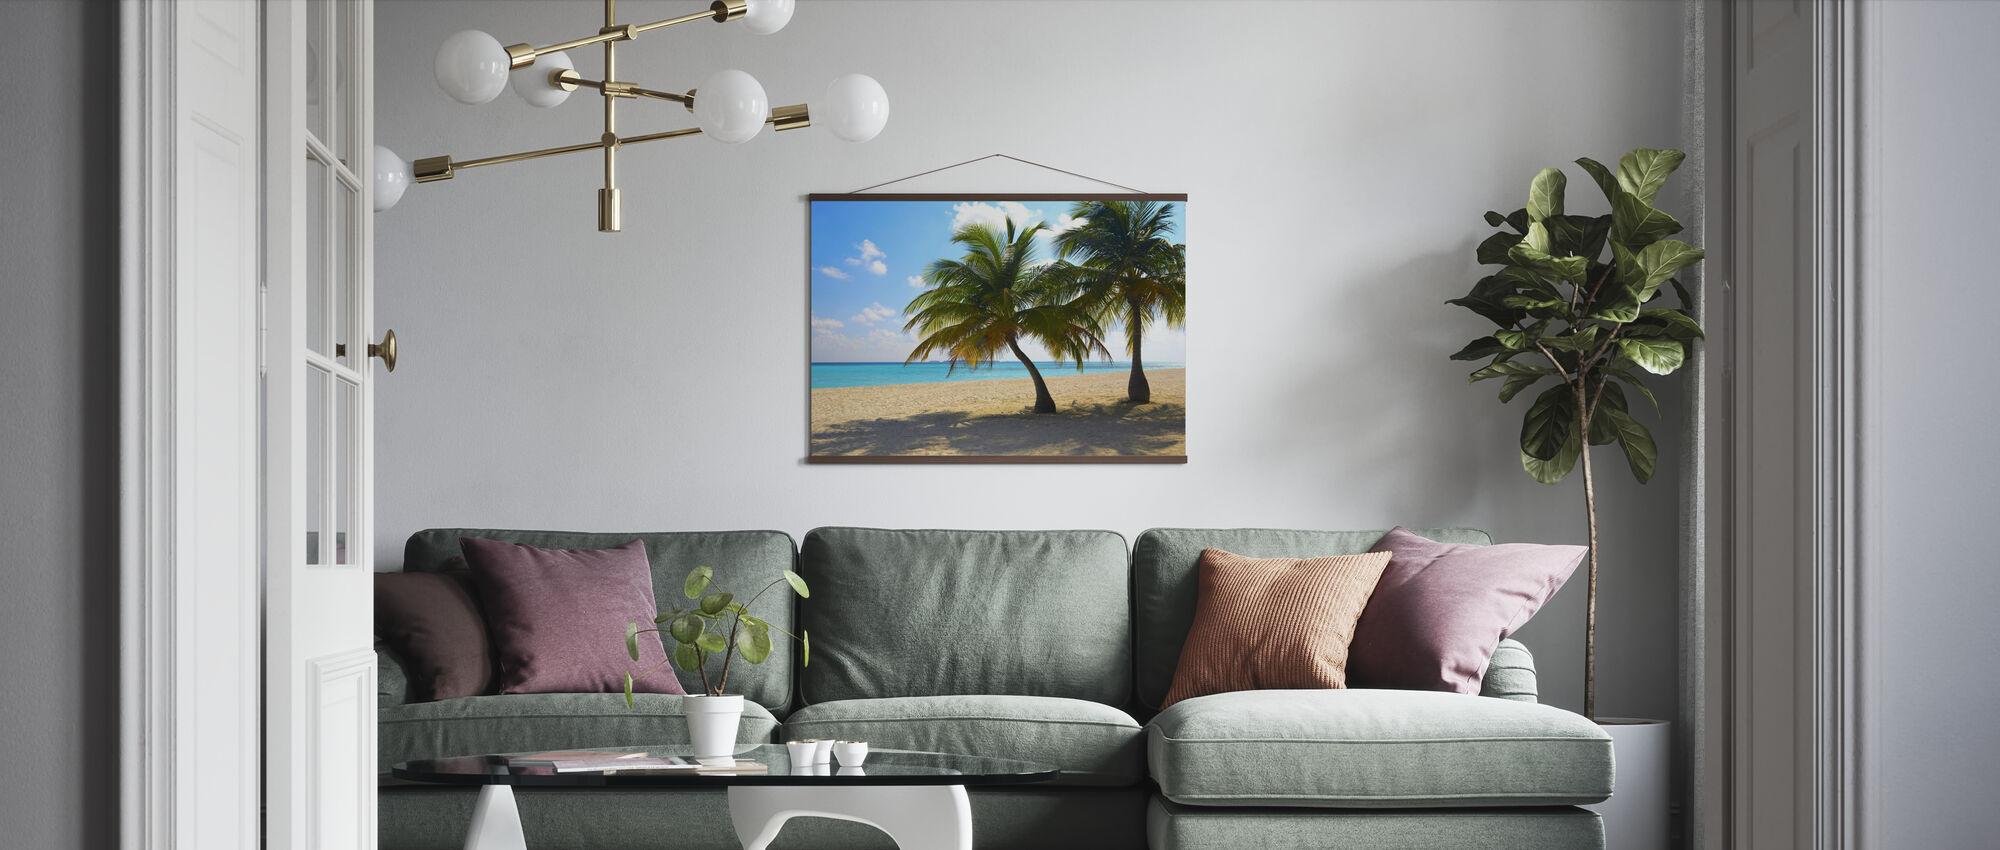 Maldives - Poster - Living Room